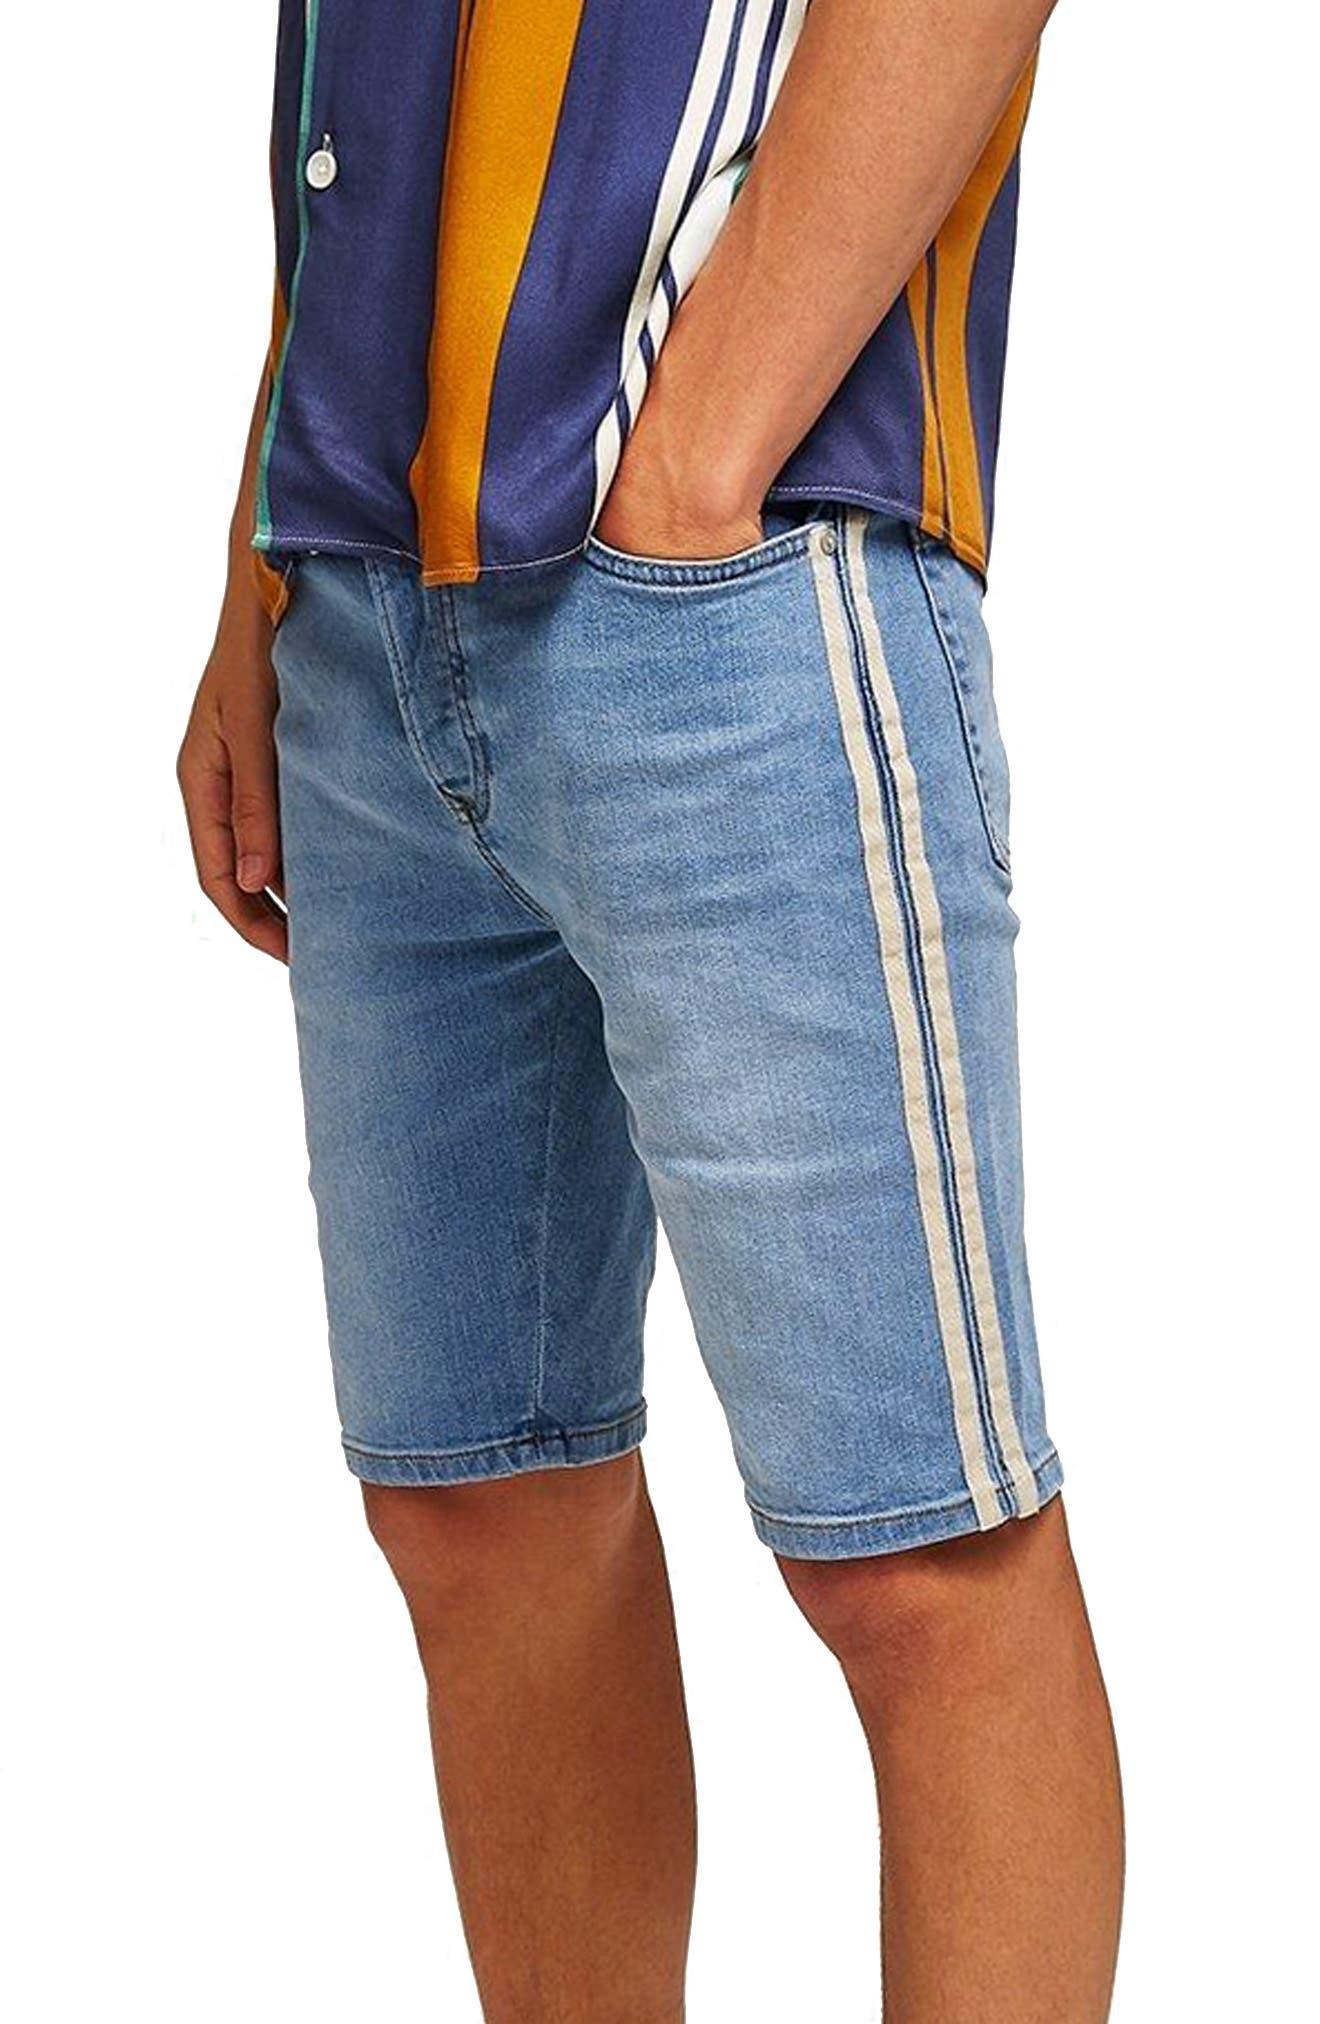 Tape Stretch Skinny Fit Denim Shorts,                         Main,                         color, Blue